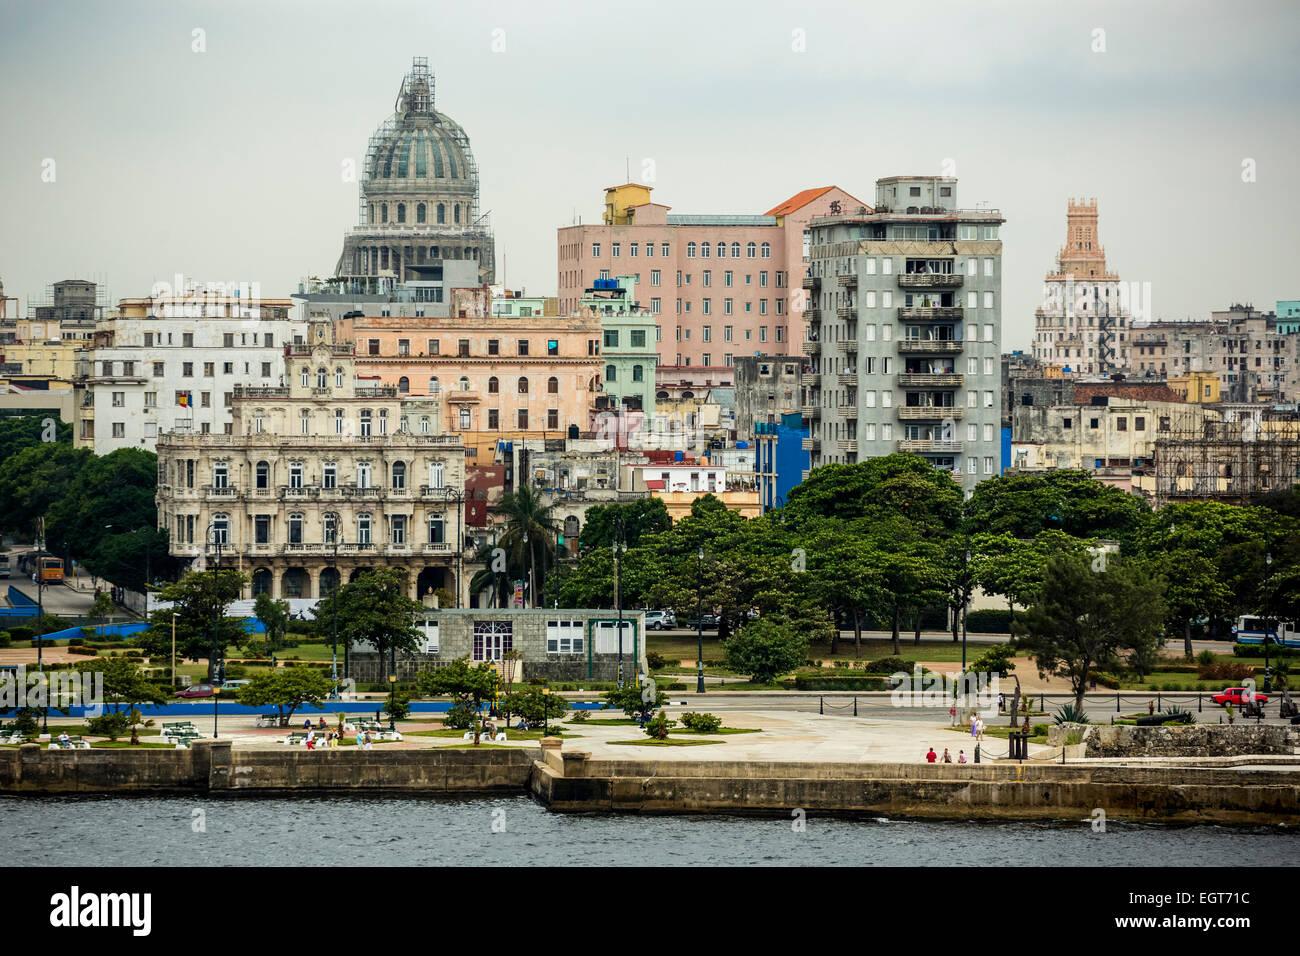 Havana Bay, harbour bay of Old Havana with the Malecón, Capitol Nacional, La Habana, Havana, Cuba - Stock Image